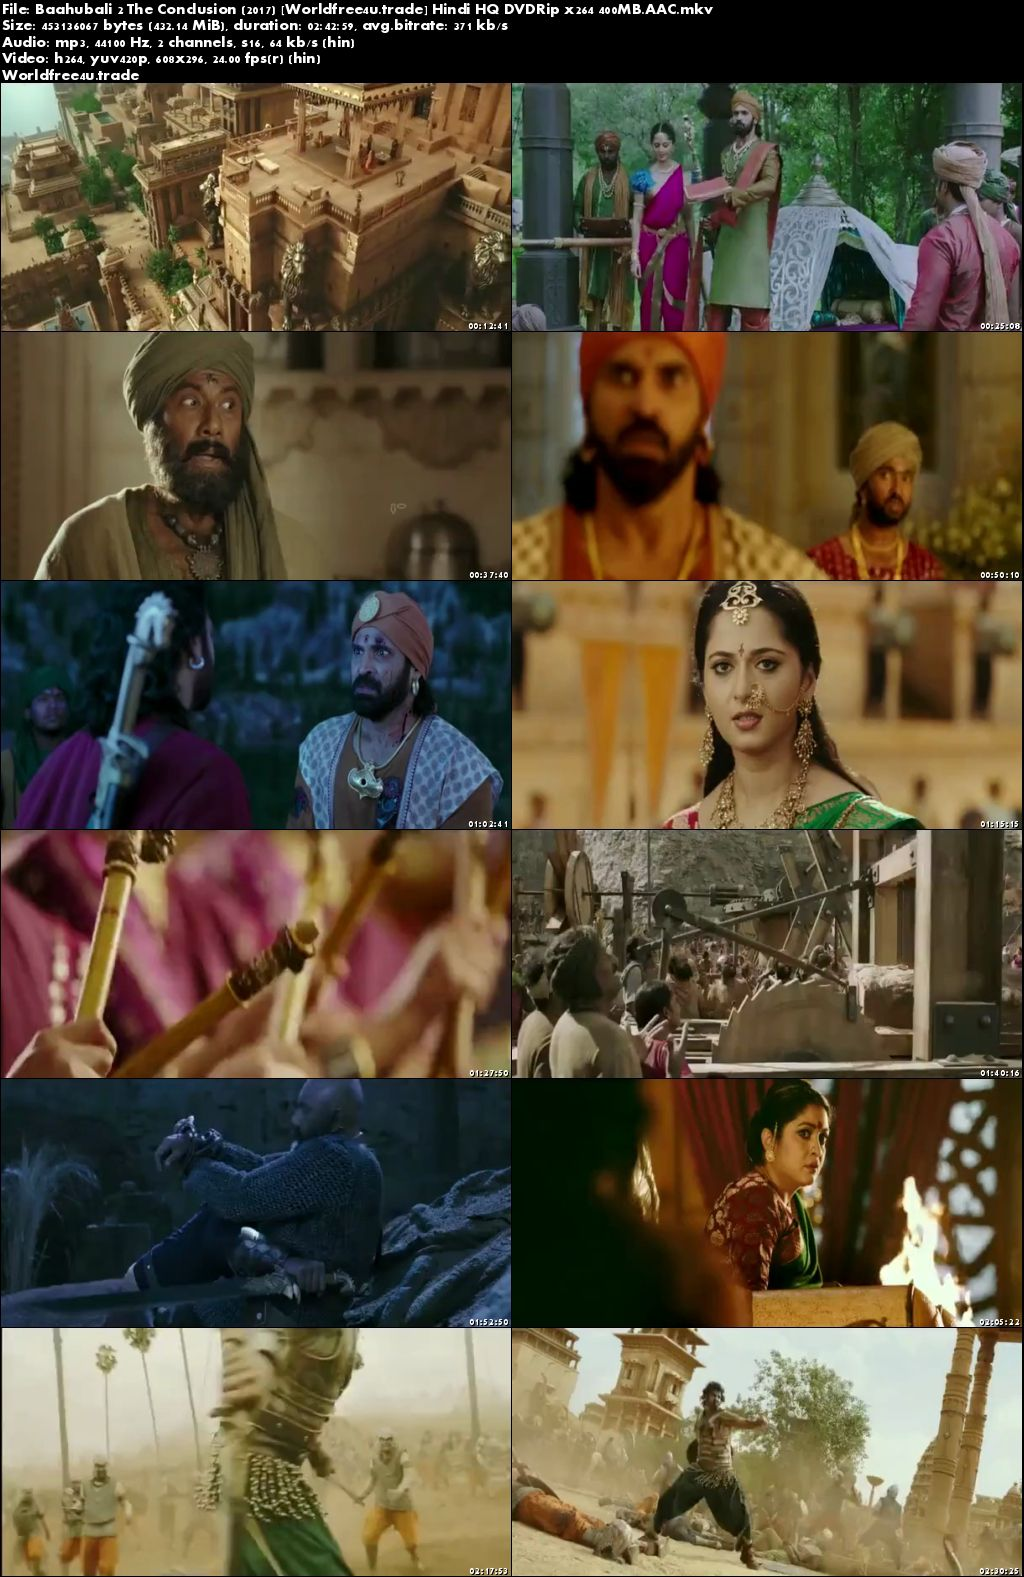 Screen Shots Baahubali 2 (2017) Full HD Movie Download Hindi Dubbed 400MB